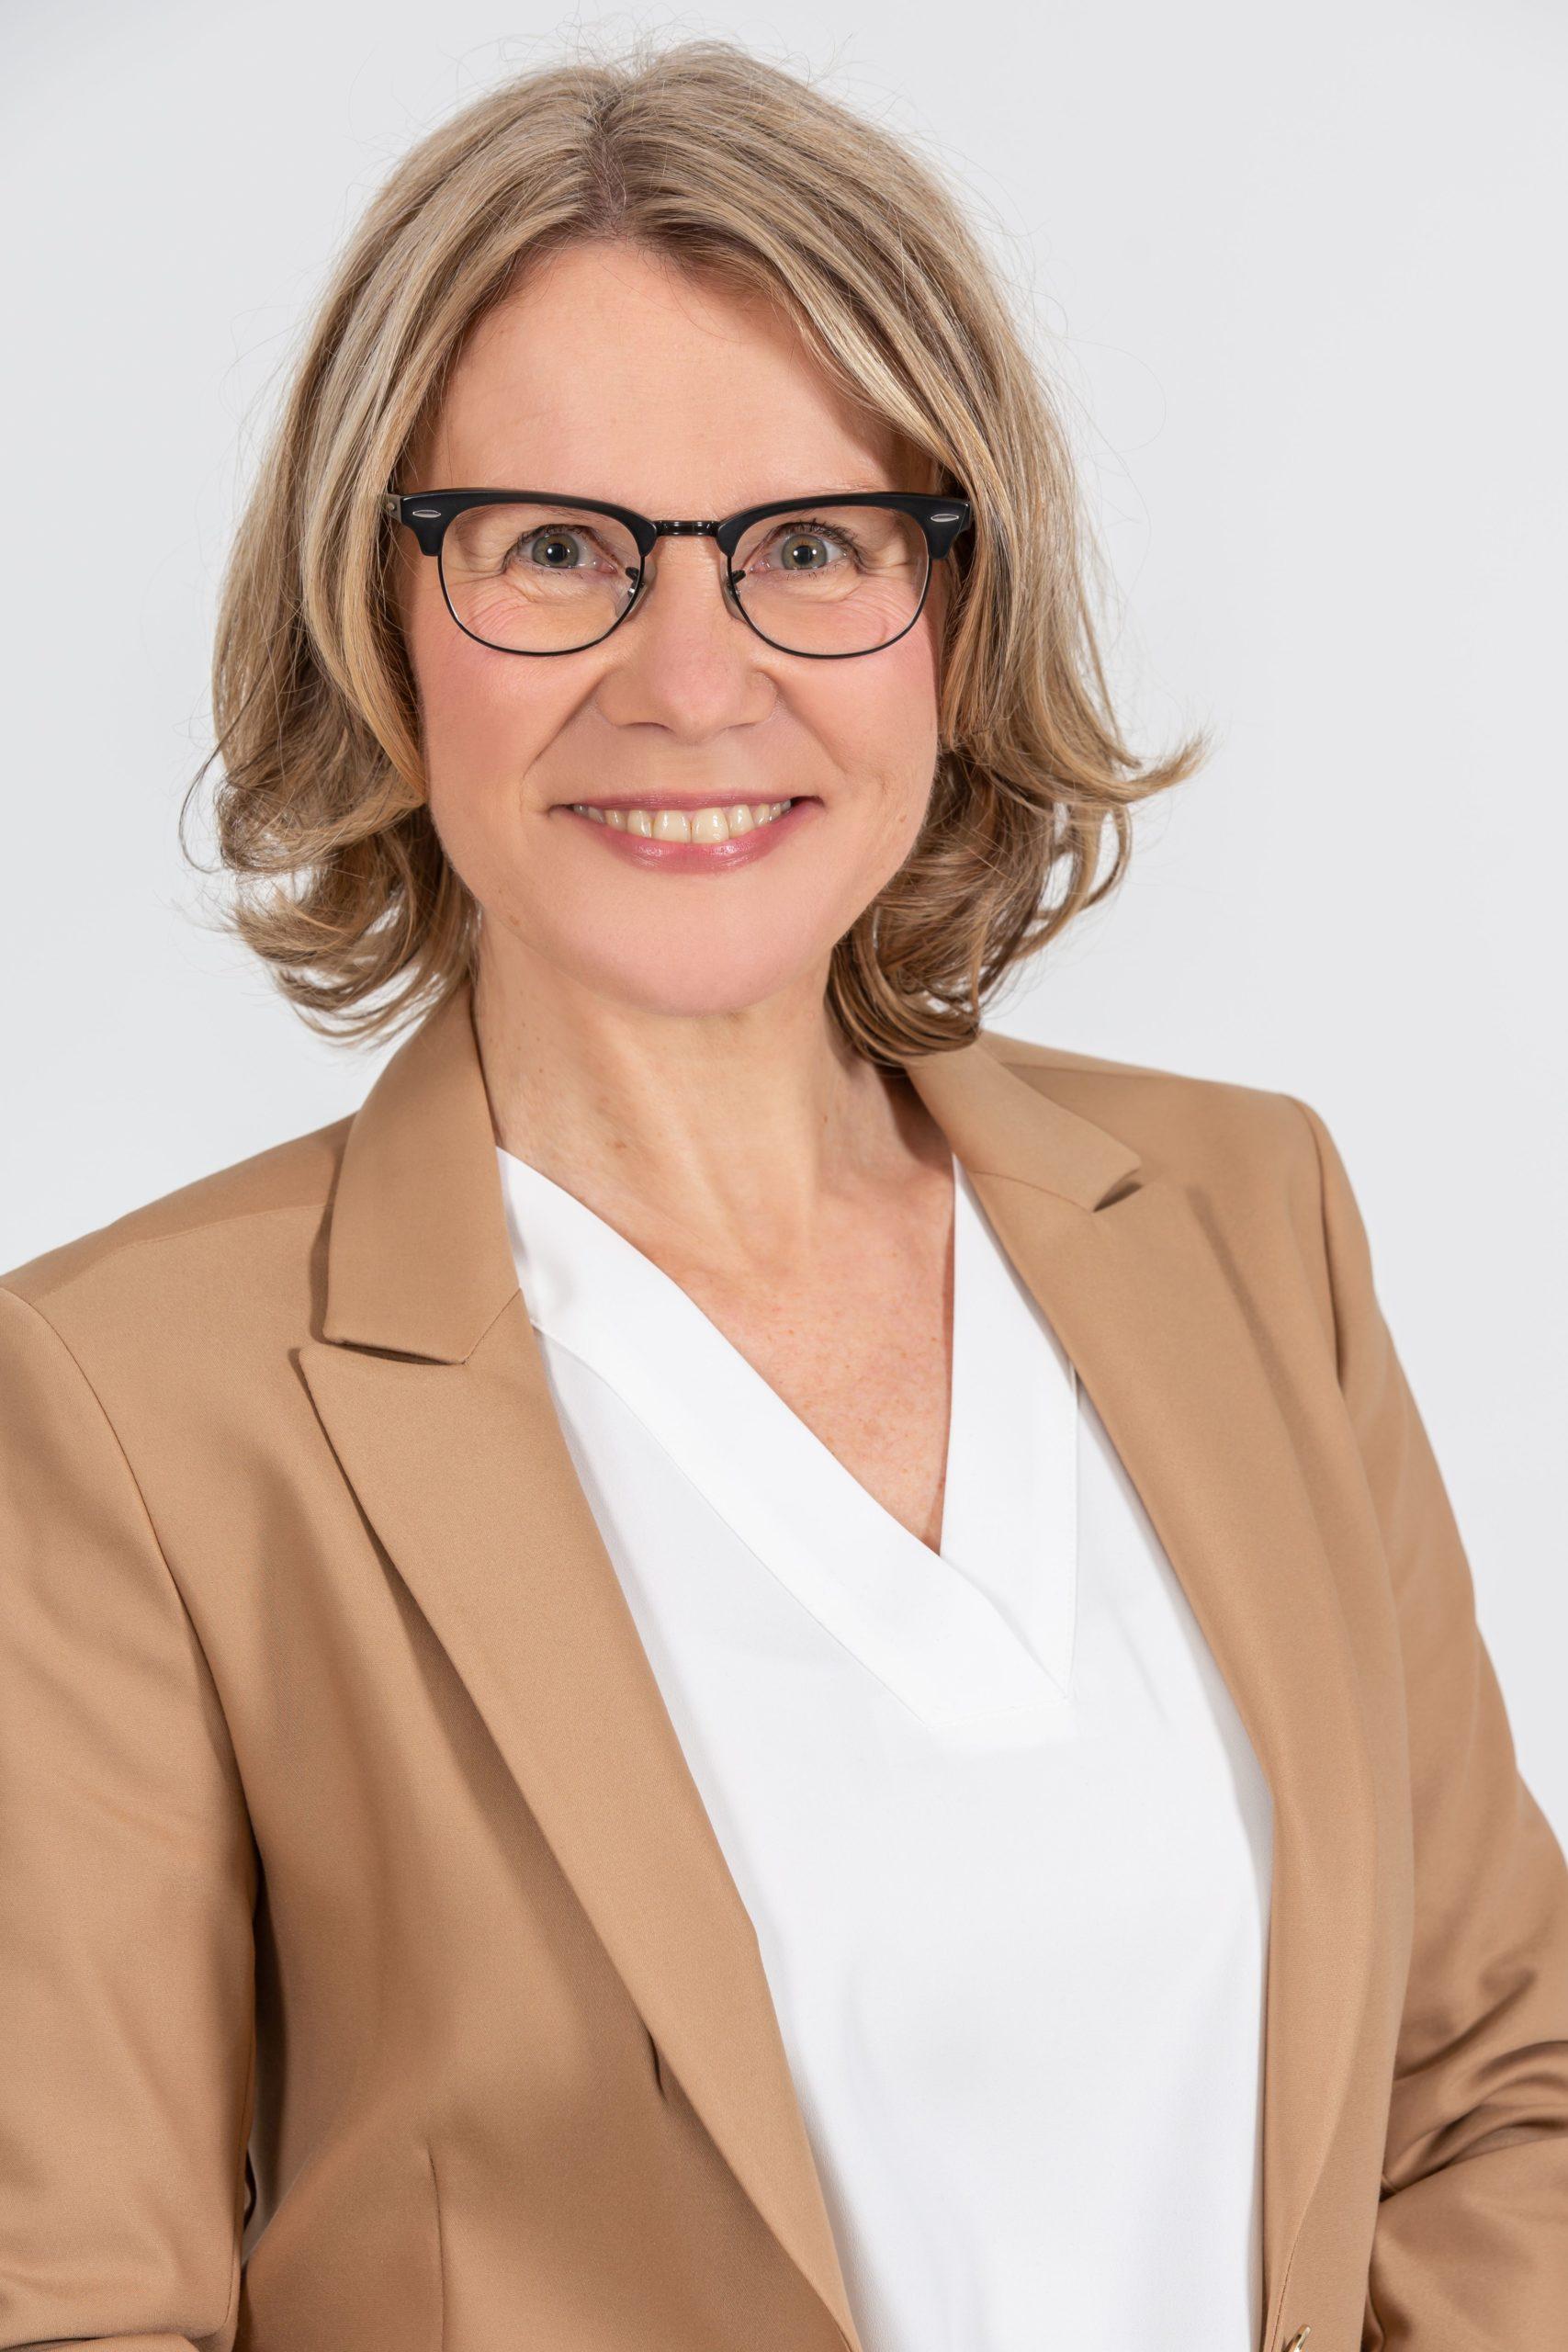 Kirsi Hofmeister-Streit